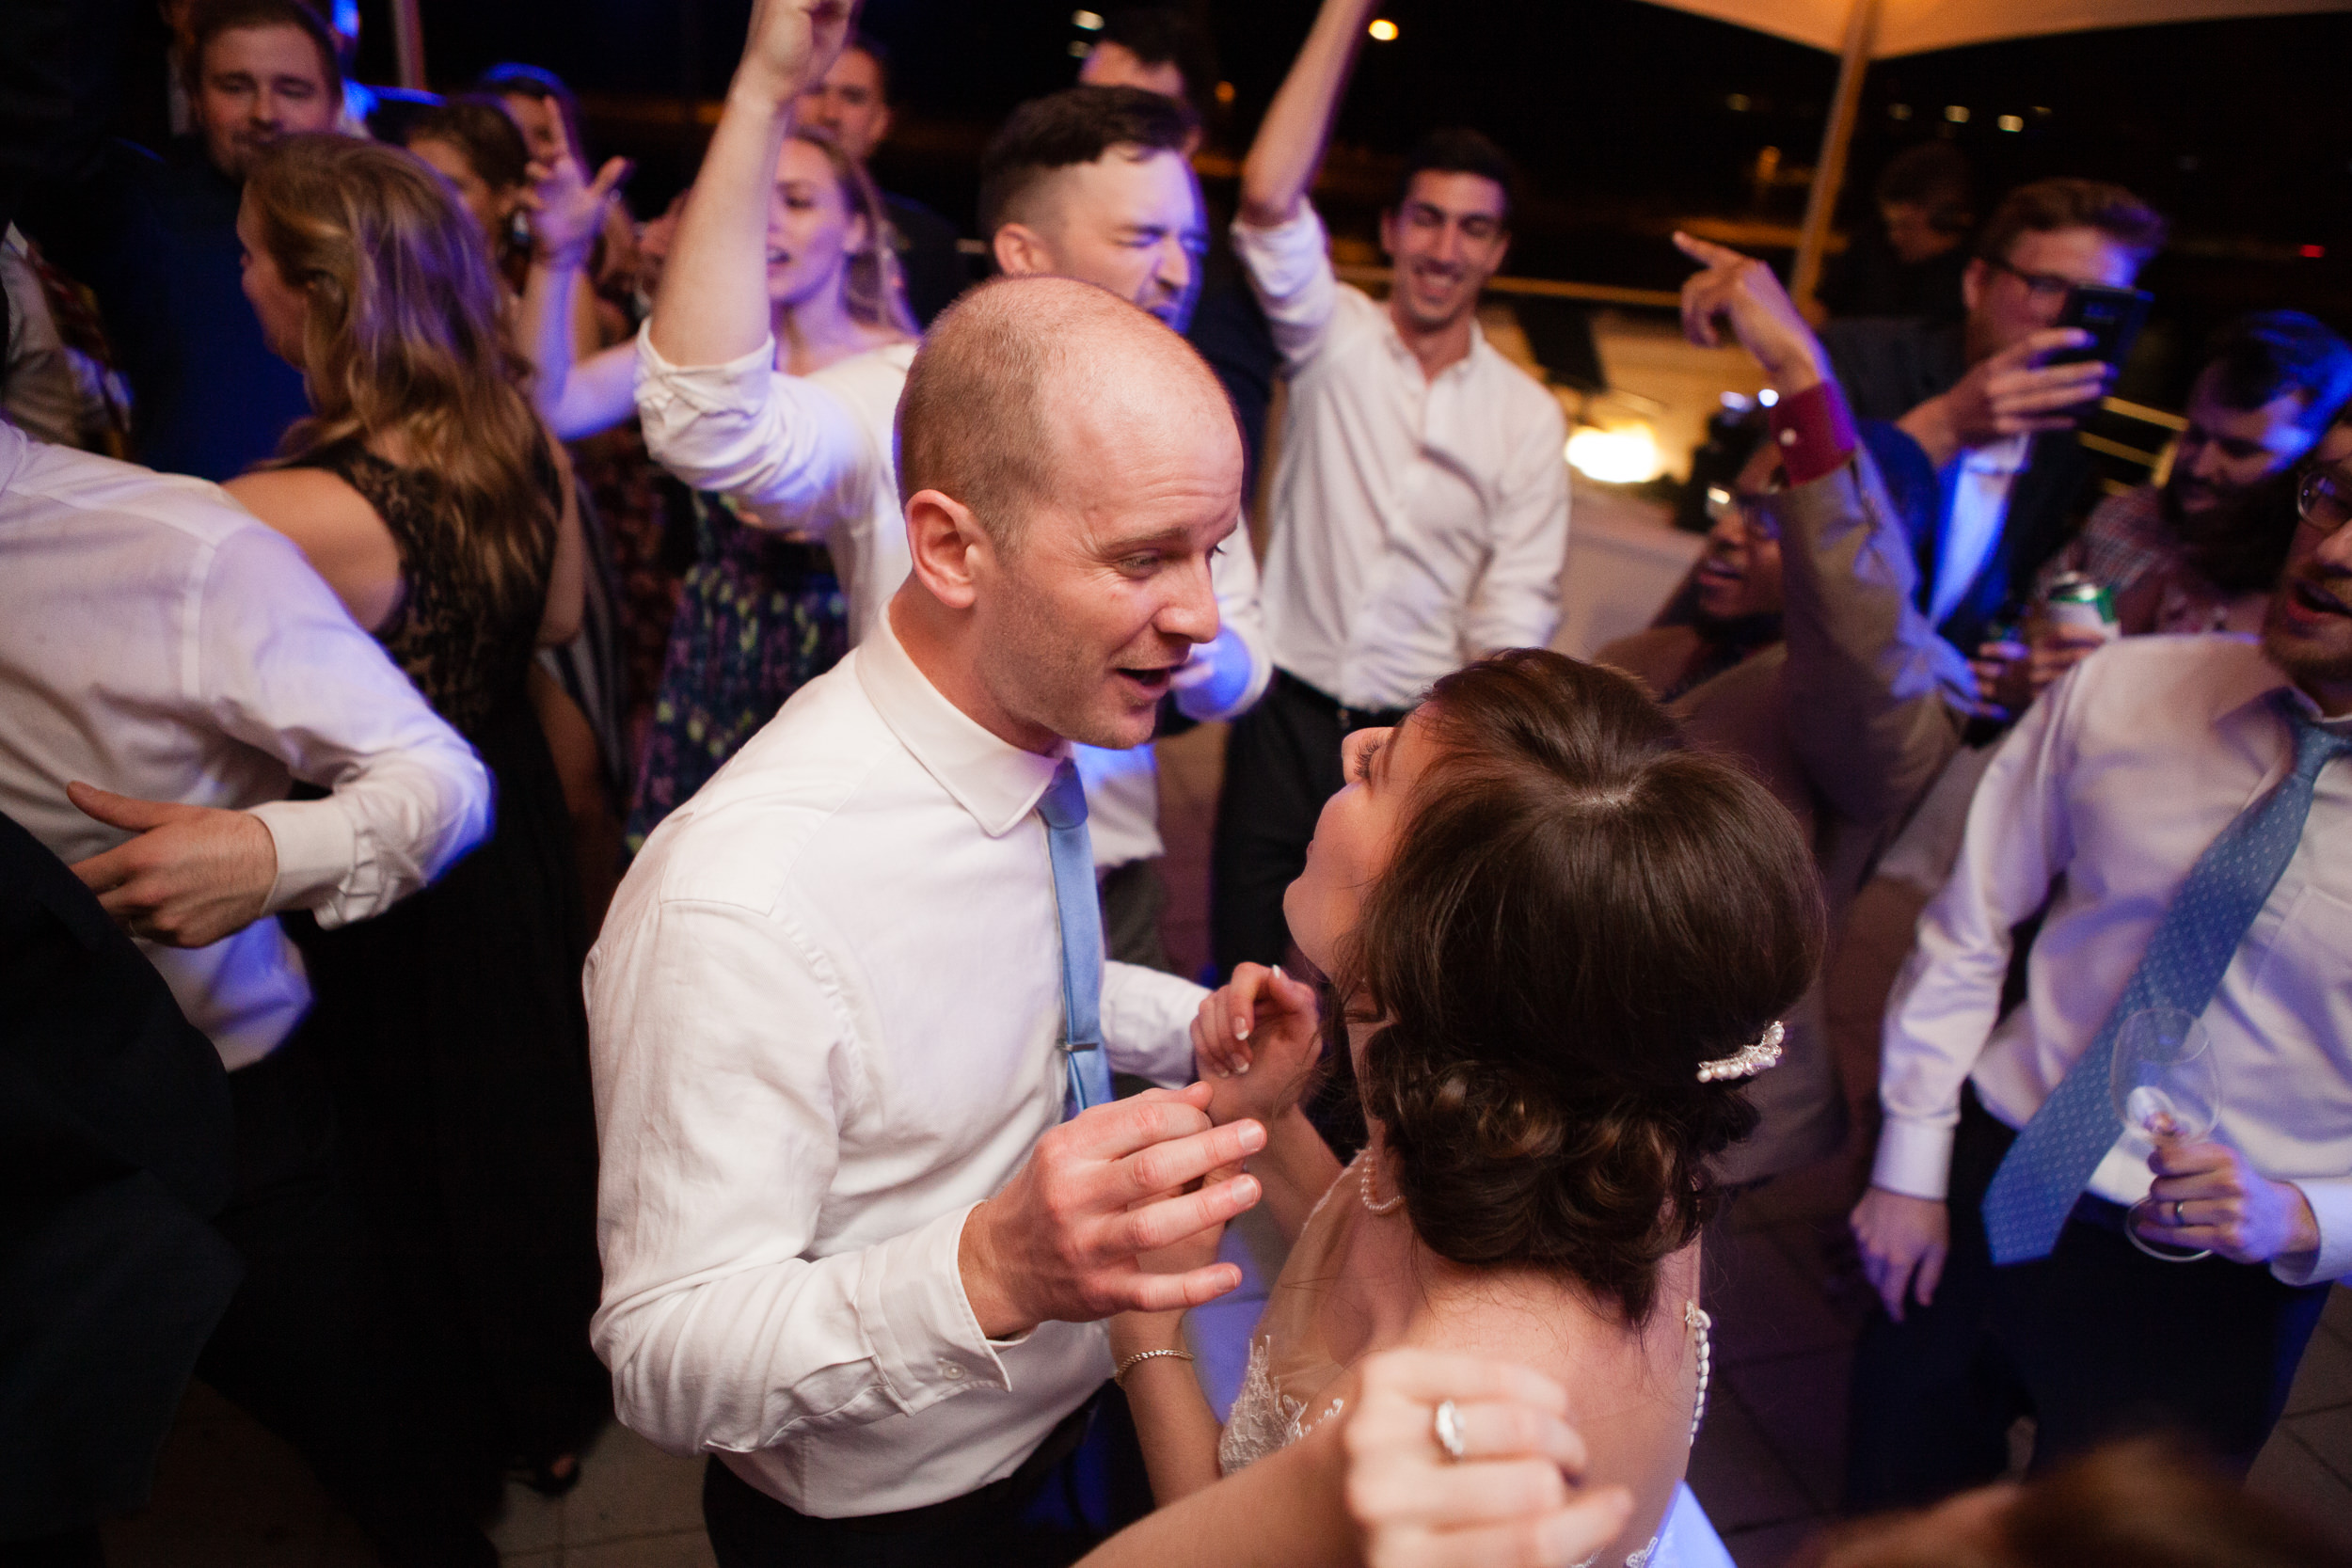 AB_Auburn_Wedding_2019-00097.jpg